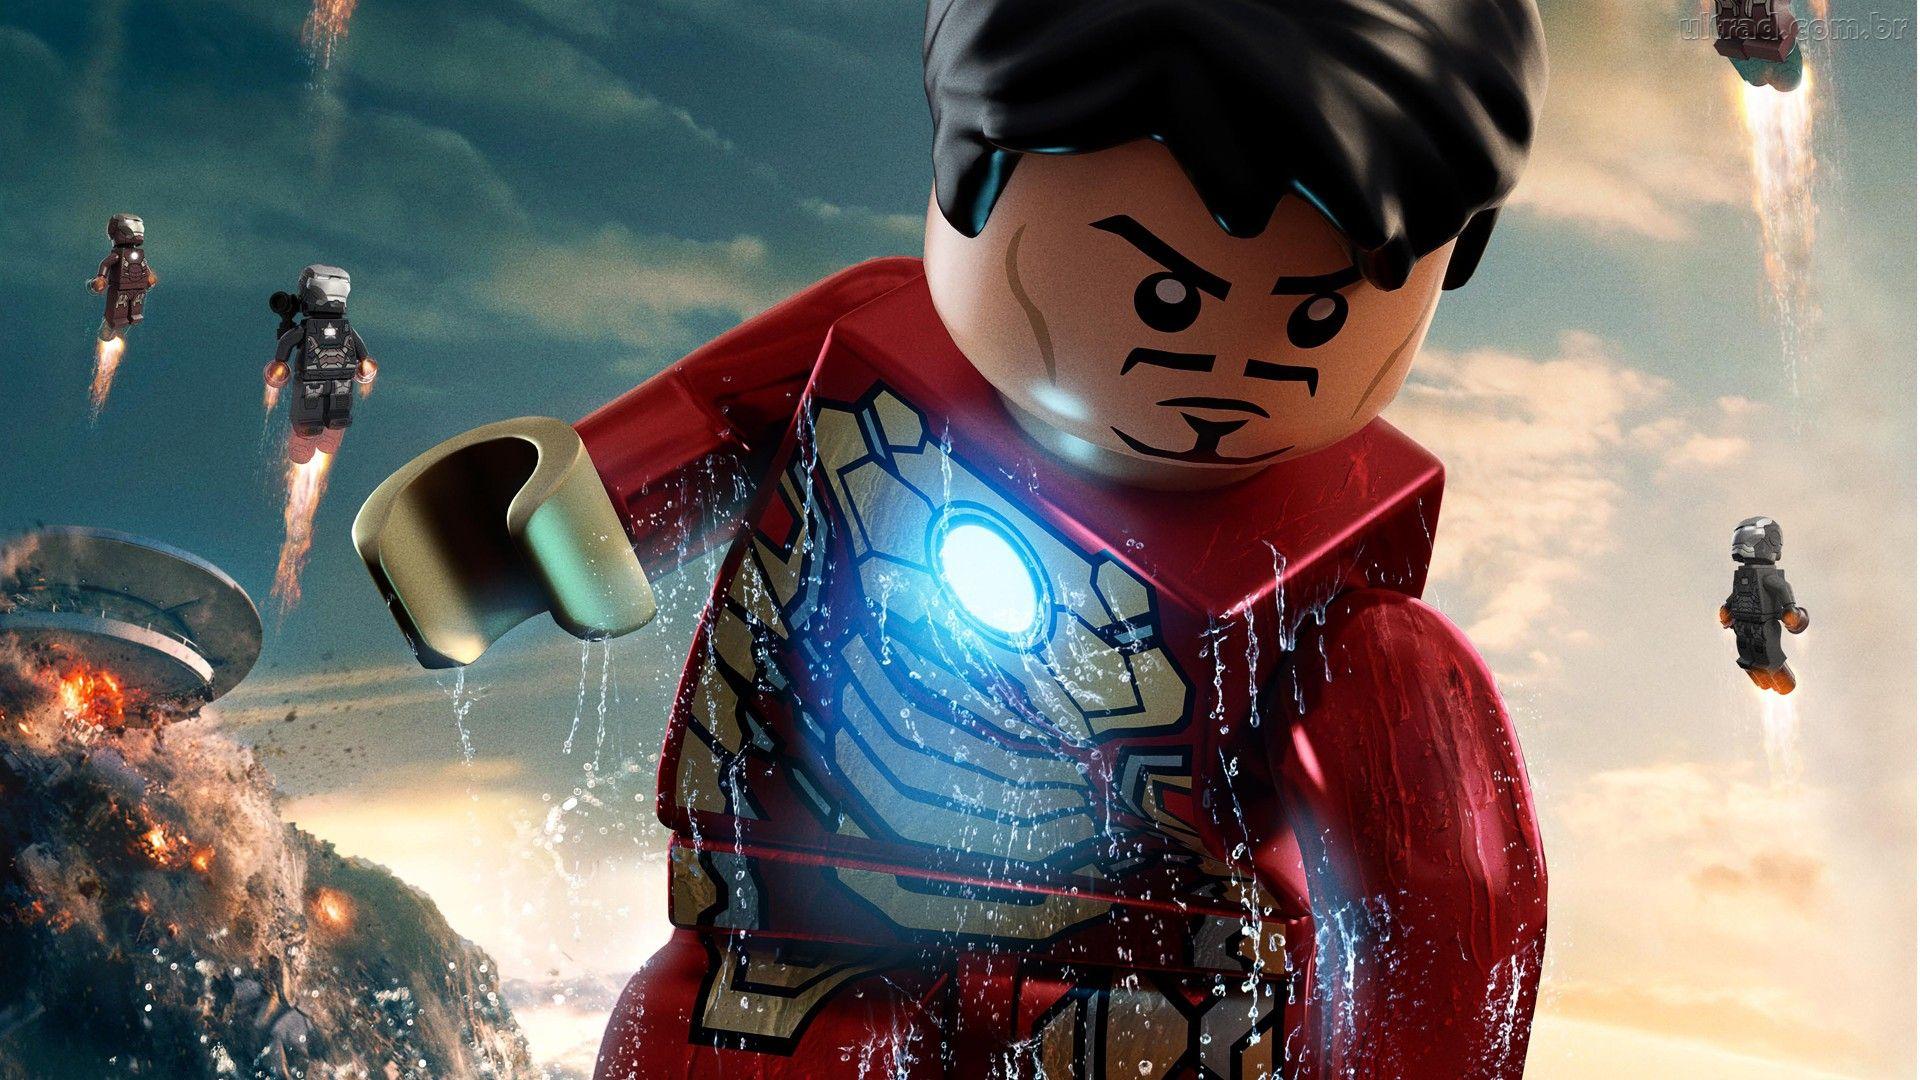 50 lego spiderman wallpaper on wallpapersafari - Avengers superhero wallpaper ...